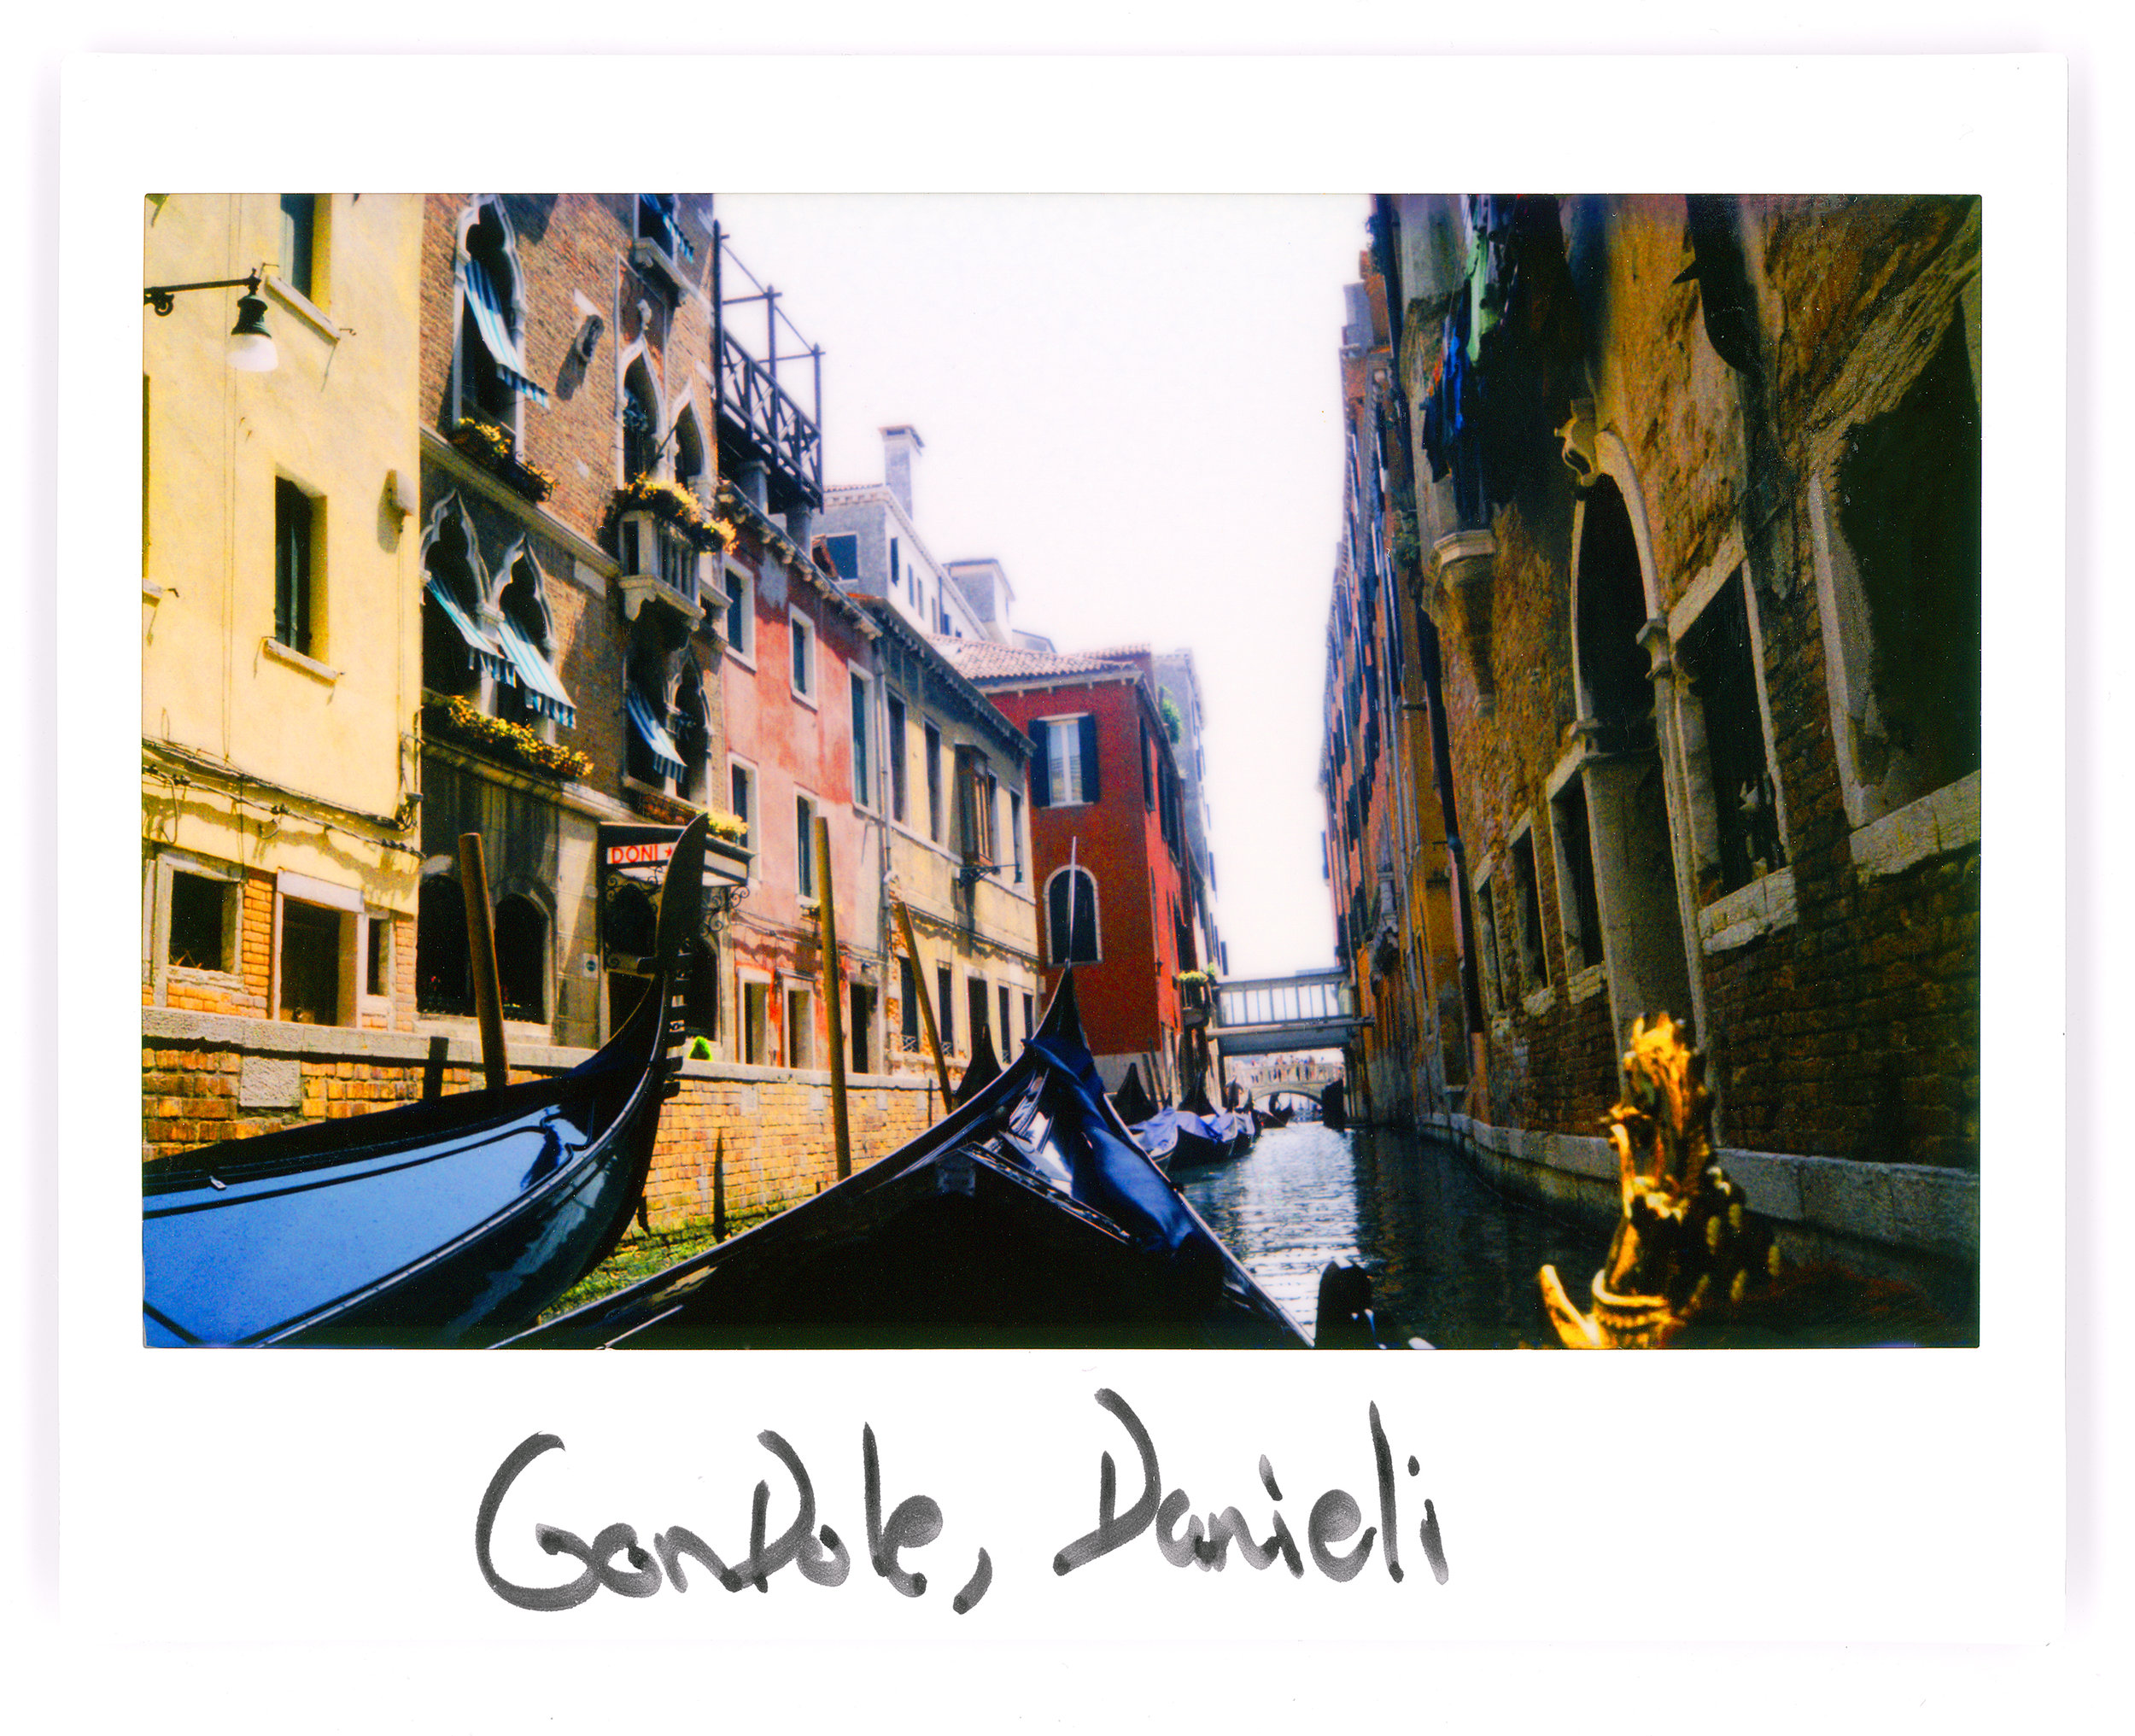 40_Gondole_Danieli copy.jpg